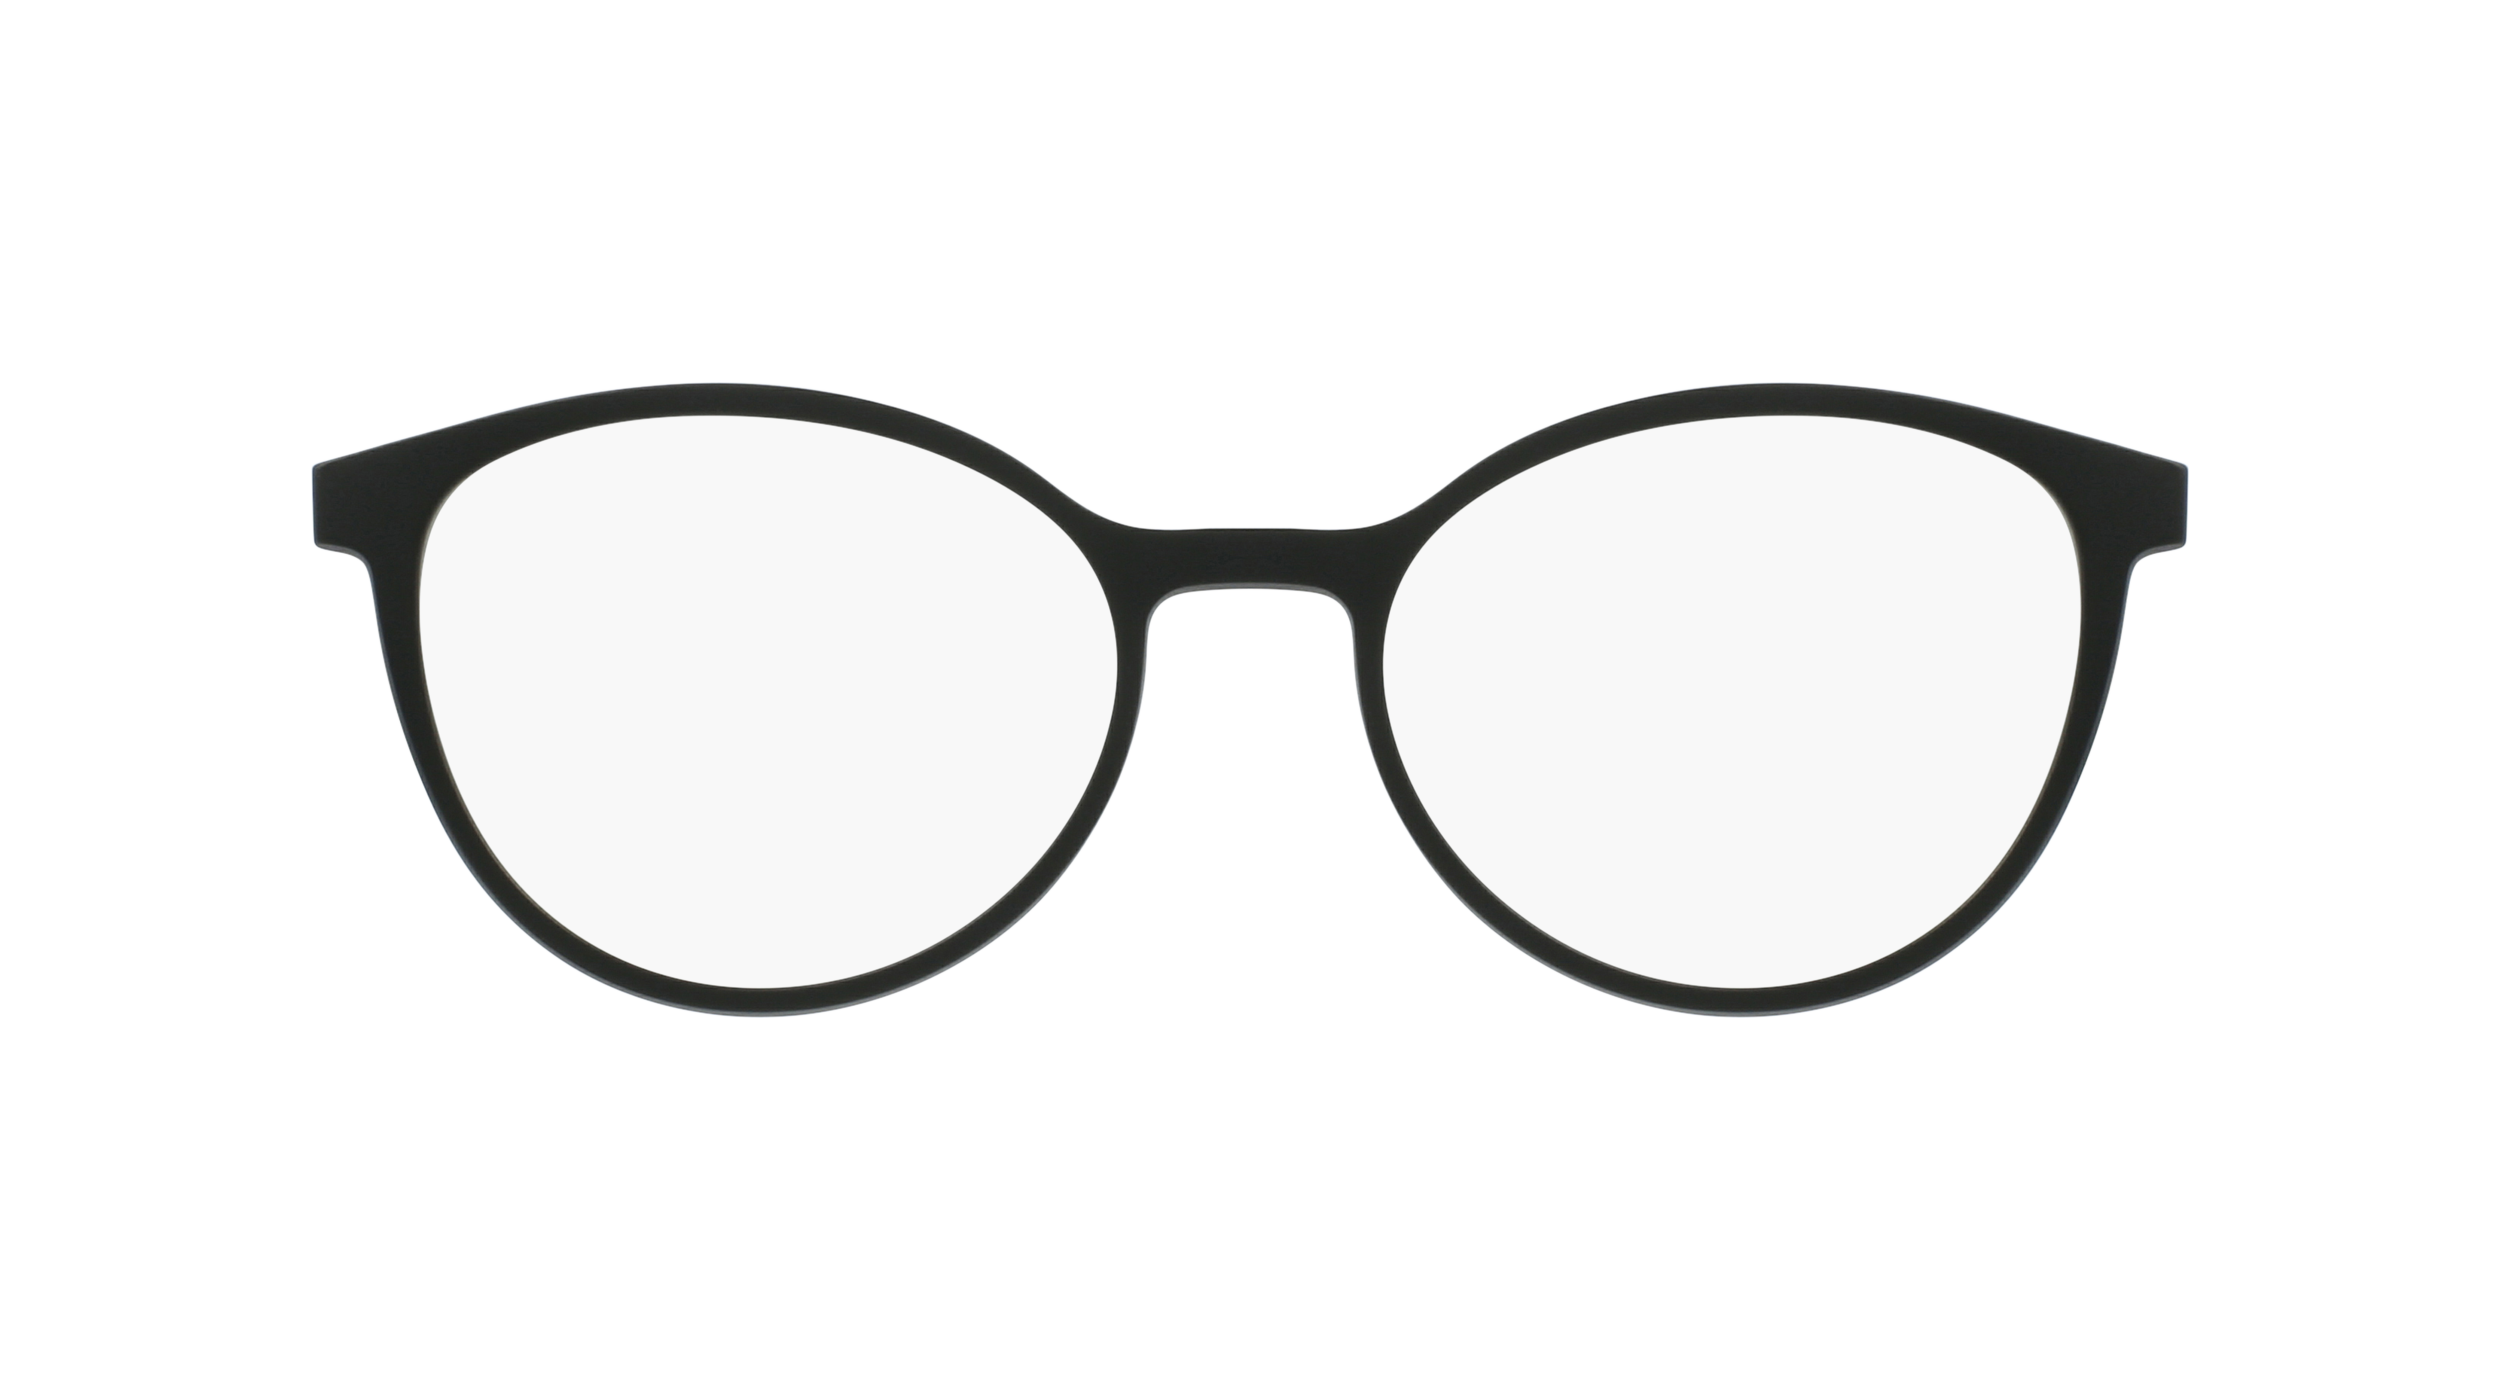 afflelou/france/products/smart_clip/clips_glasses/07630036459089.png